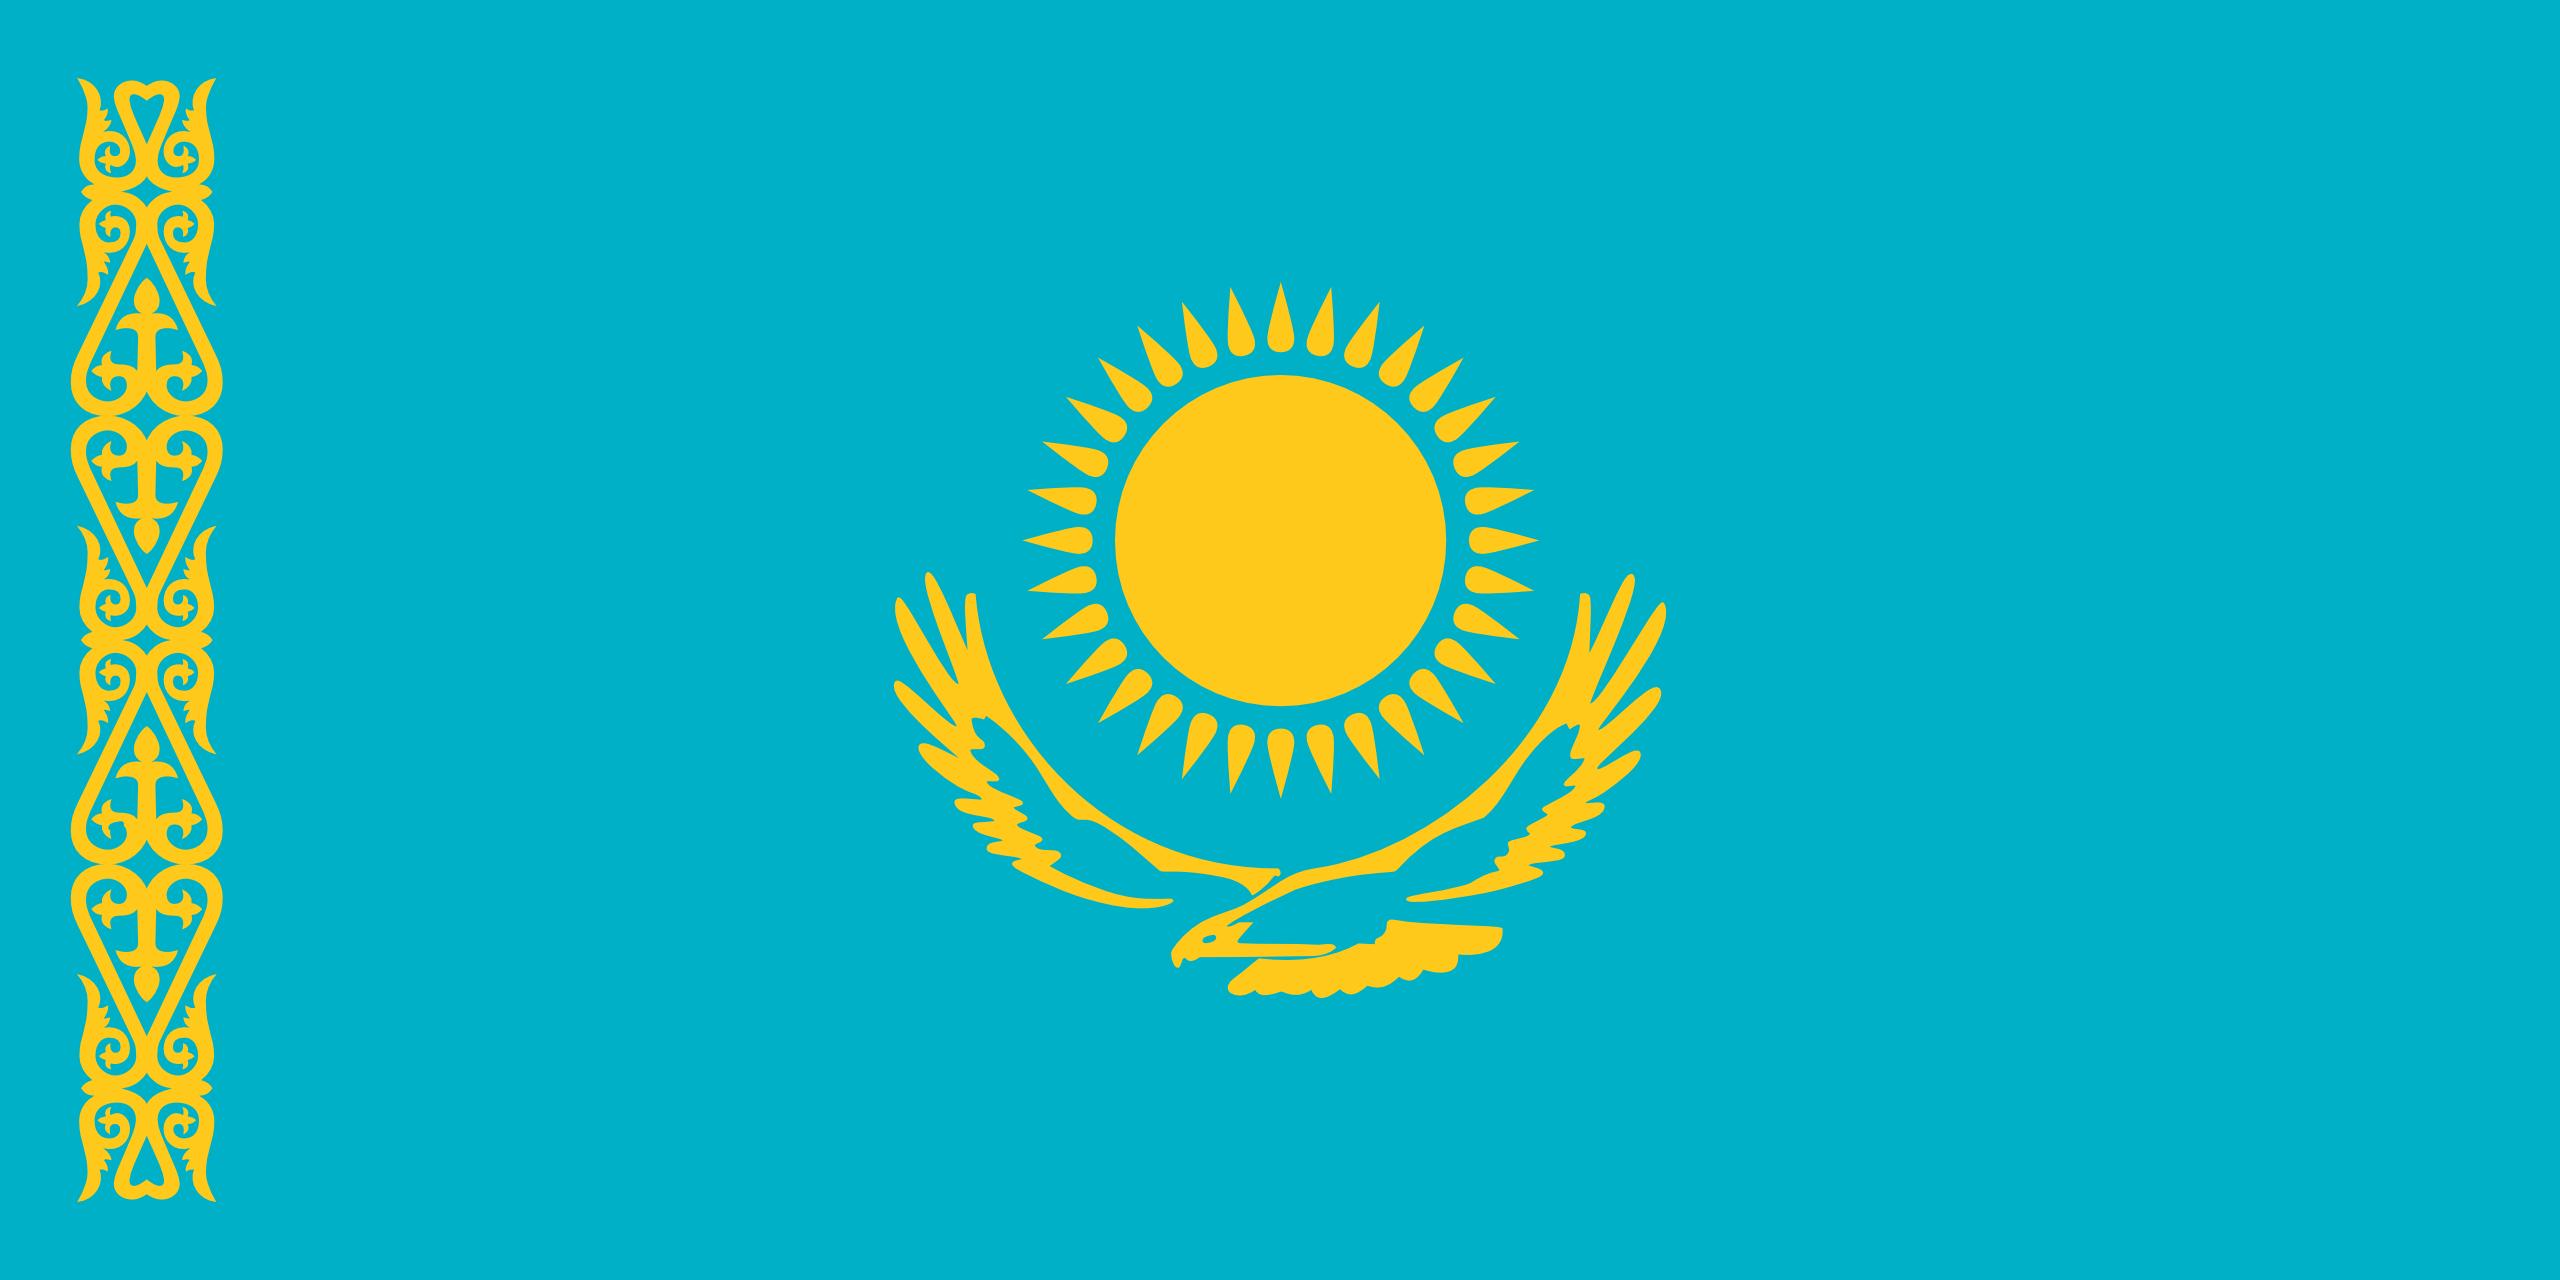 kazajistán, país, emblema, insignia, símbolo - Fondos de Pantalla HD - professor-falken.com